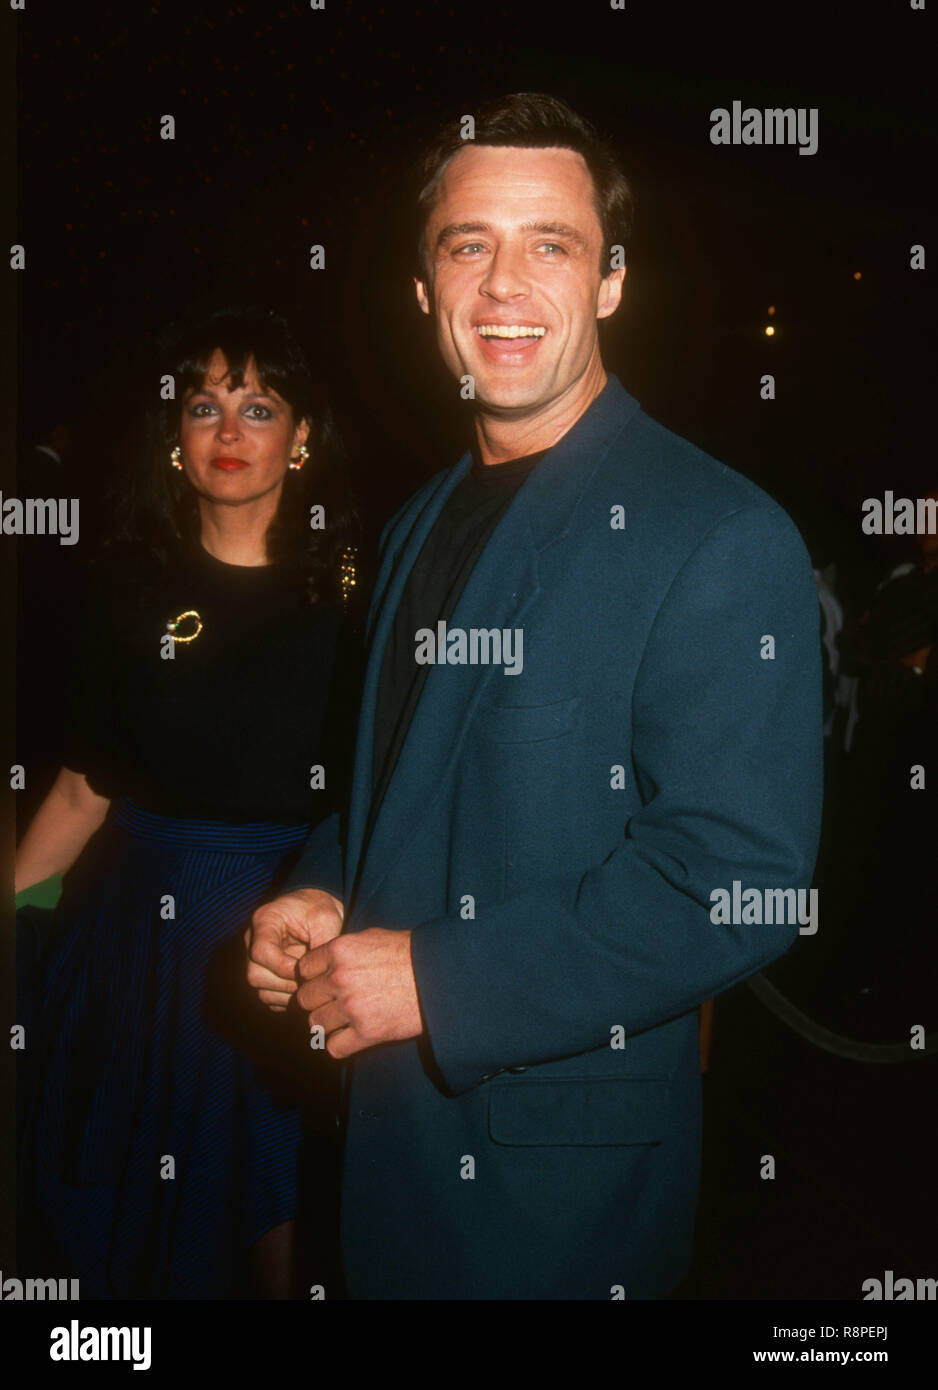 LOS ANGELES, CA - APRIL 27: Actor Joe Penny attends 'The